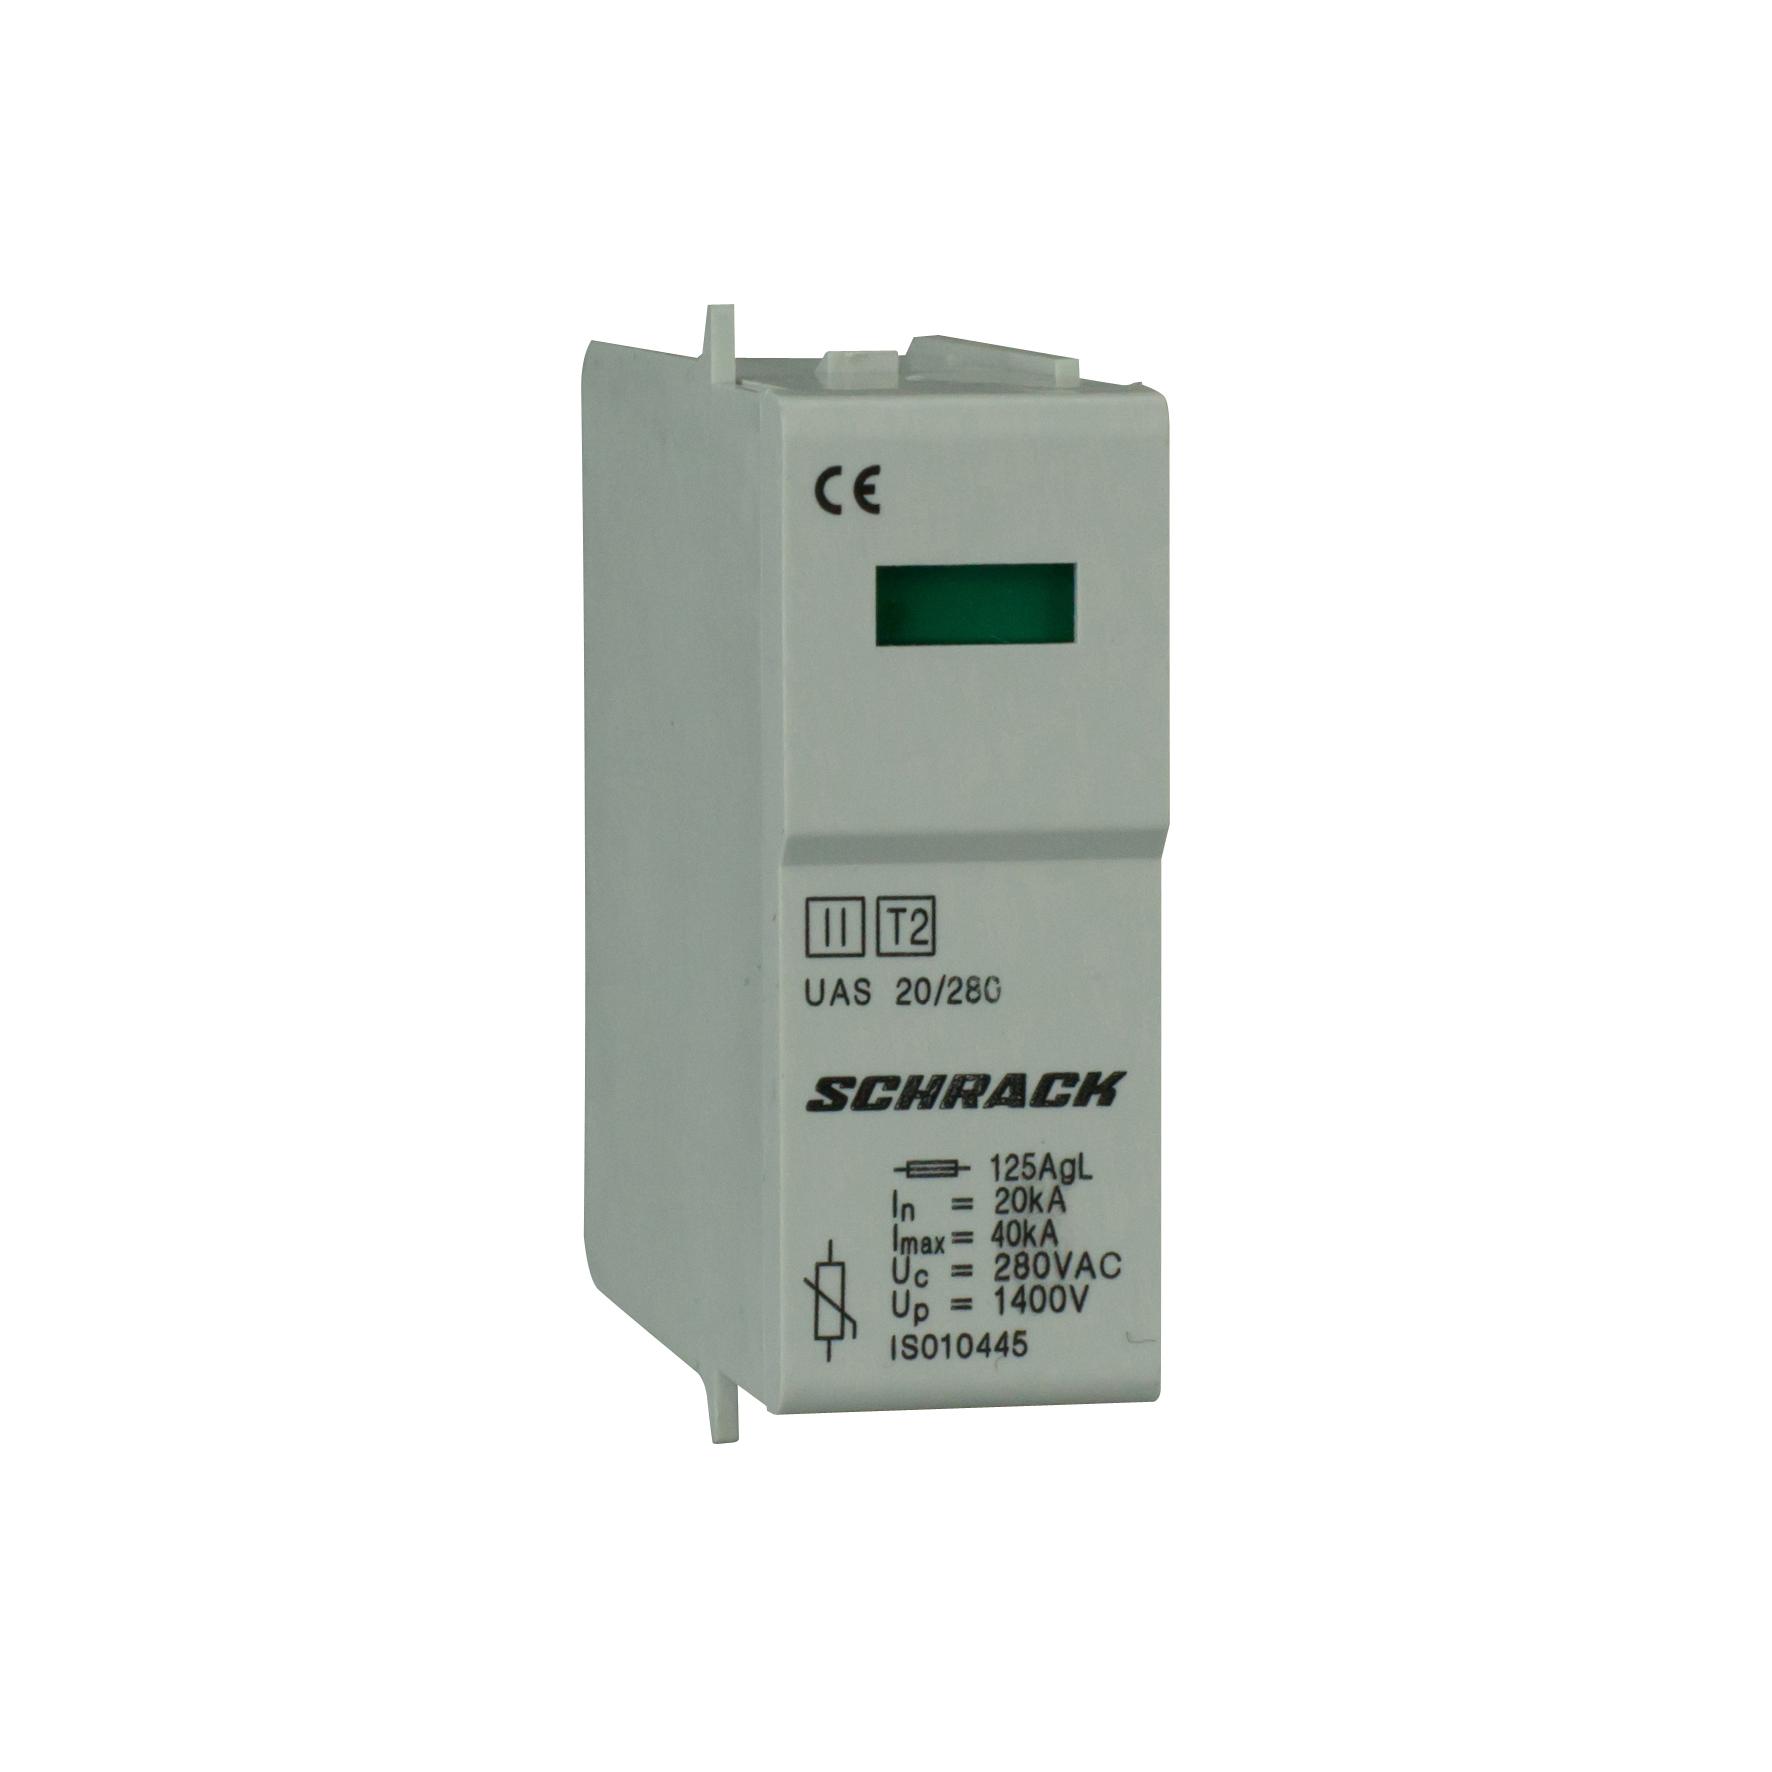 1 Stk T2/C - Ableitermoduleinsatz VV 20kA/280V - Serie UAS IS010445--